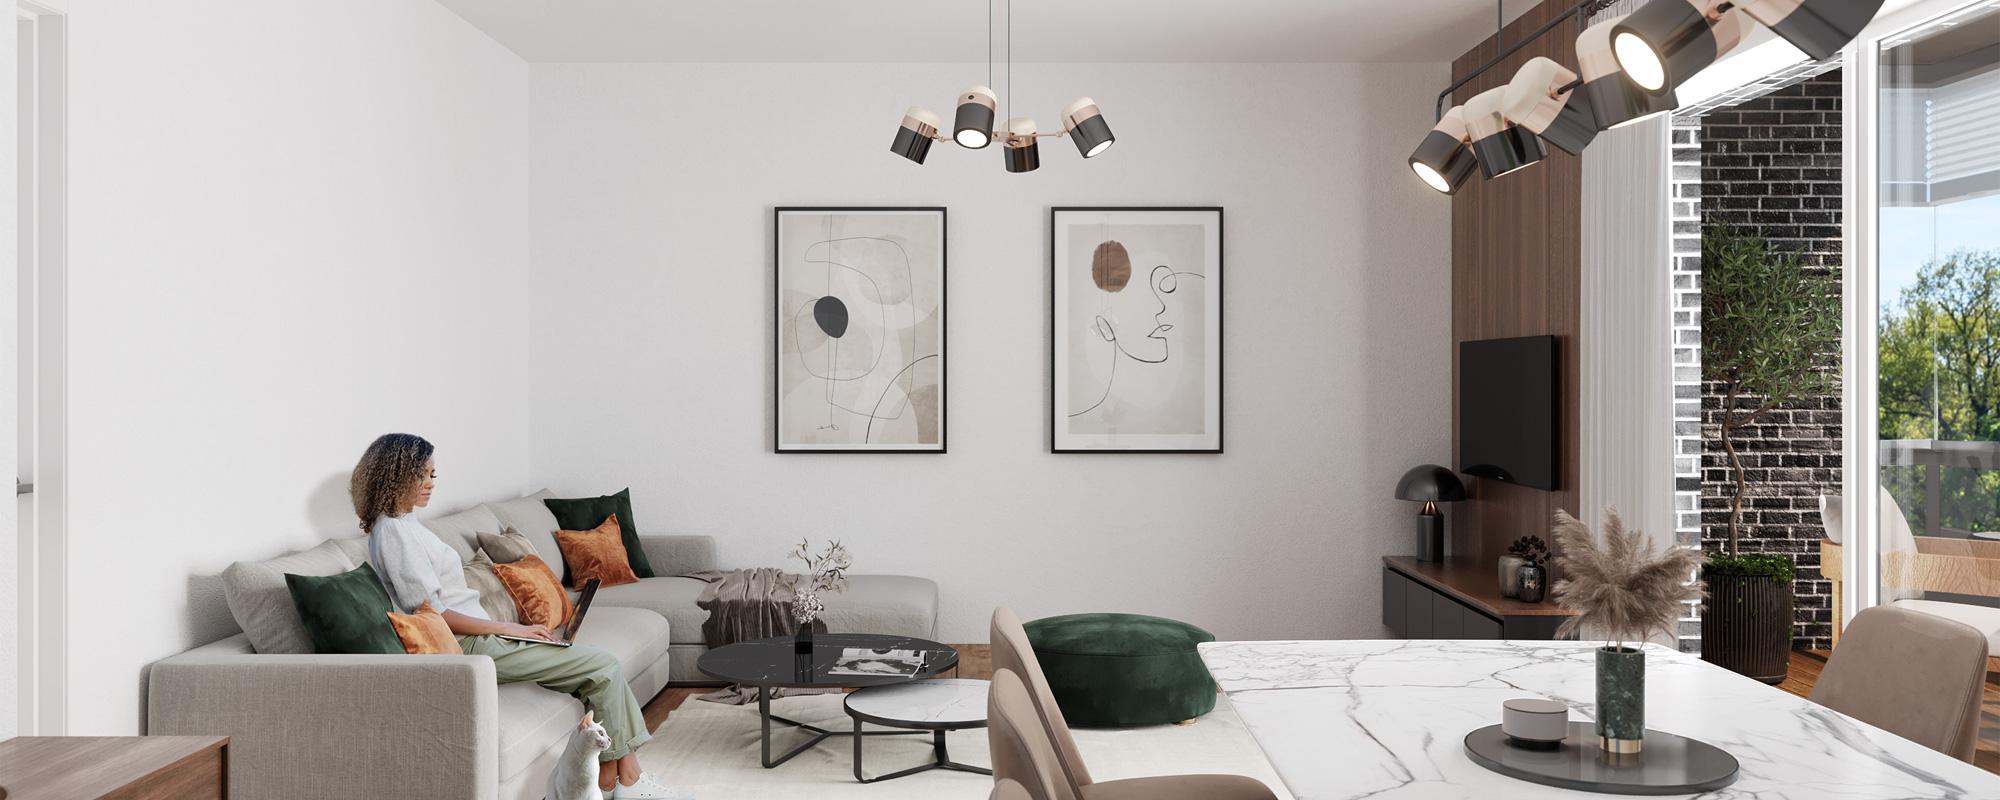 bu schmidt startseite. Black Bedroom Furniture Sets. Home Design Ideas